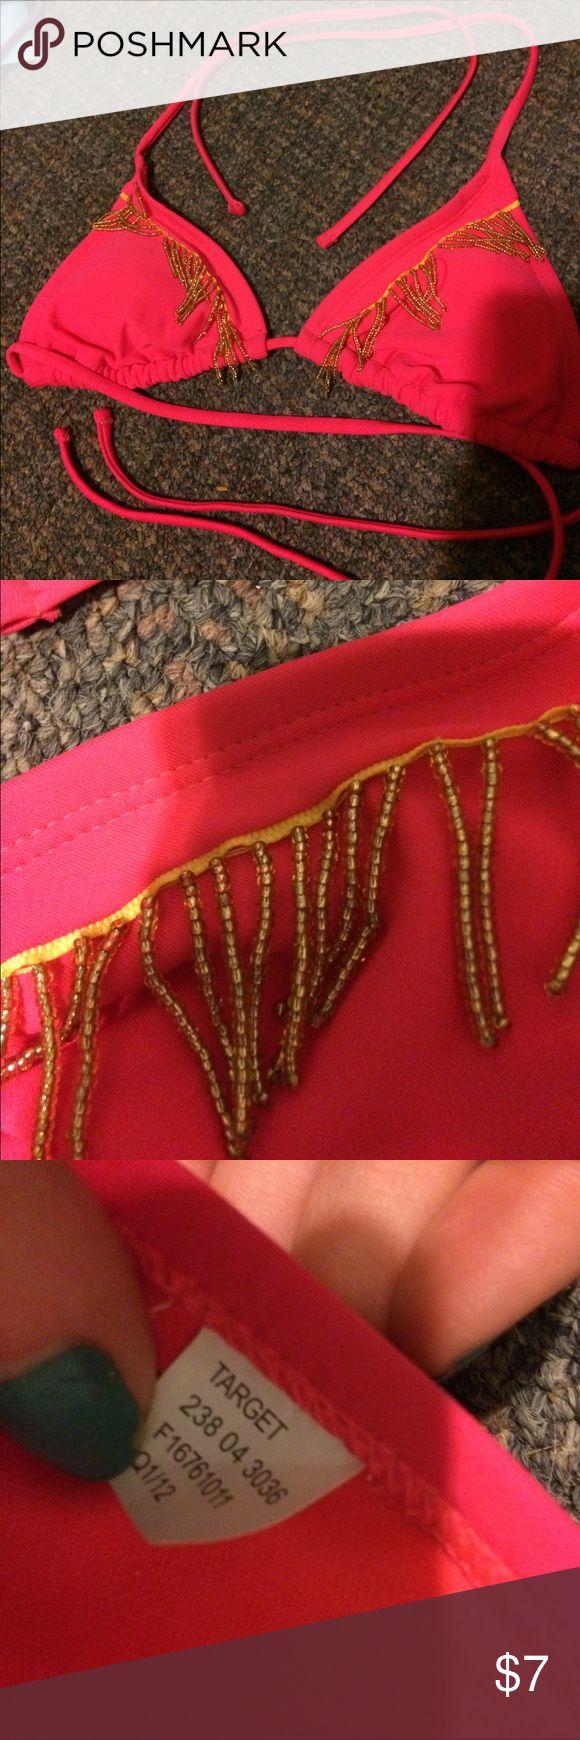 Target bikini top Cute bead fringe details. Removable padding. Never worn Xhilaration Swim Bikinis